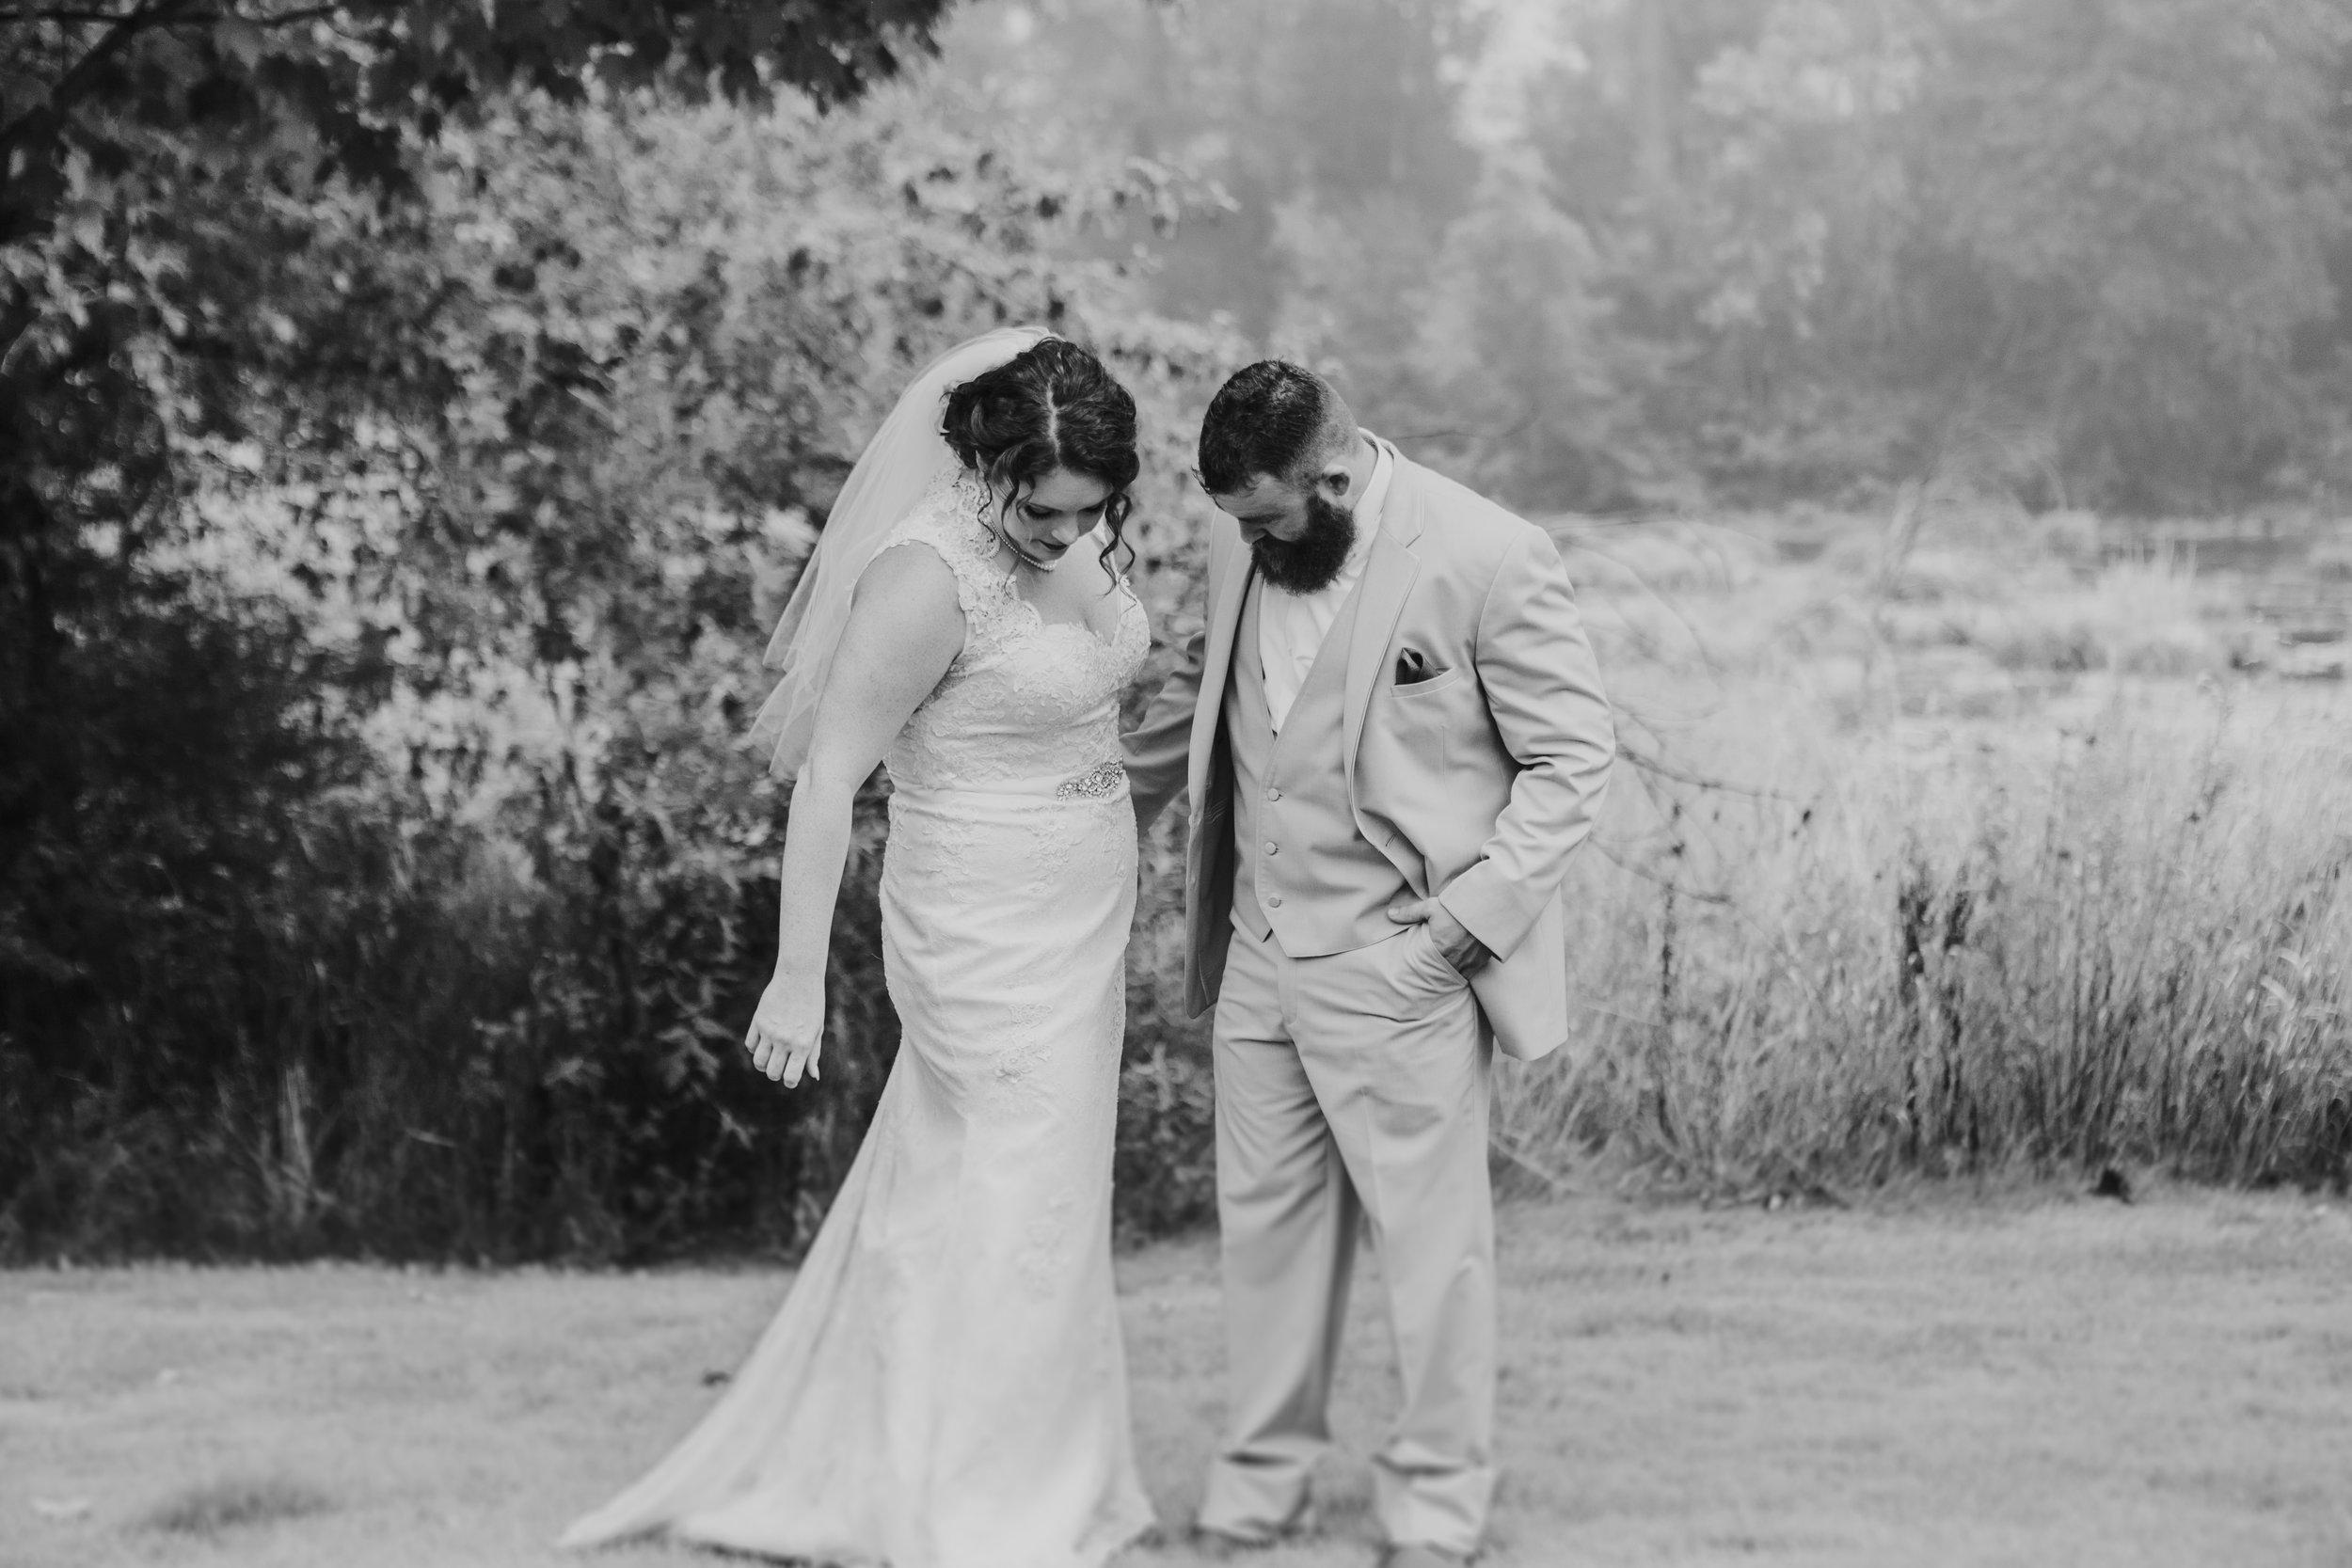 Kincheloe_Hutchings Wedding 2017 (358).jpg